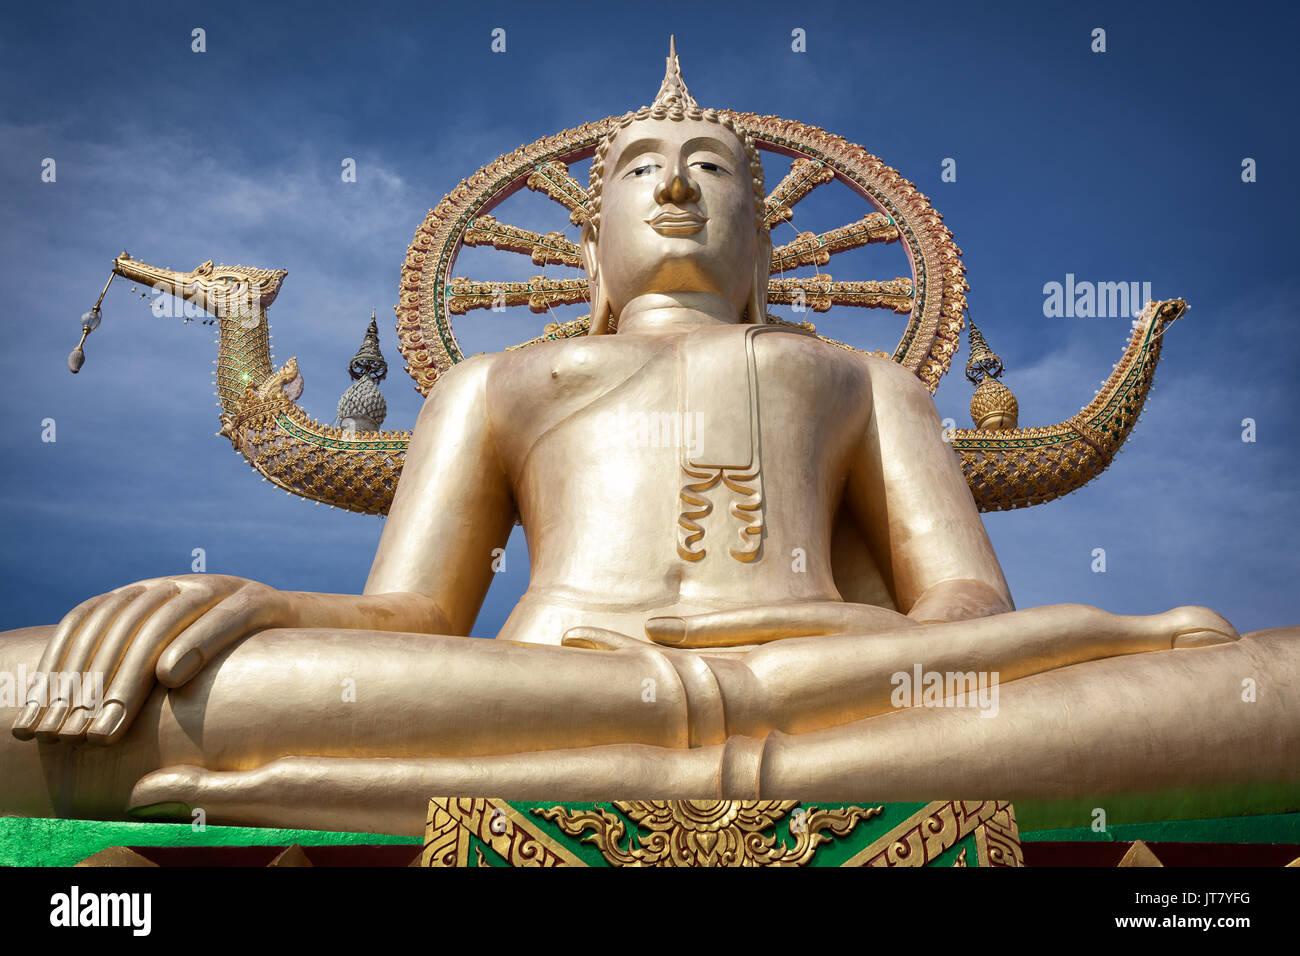 Big Buddha temple or Wat Phra Yai in Kho Samui island, Thailand - Stock Image